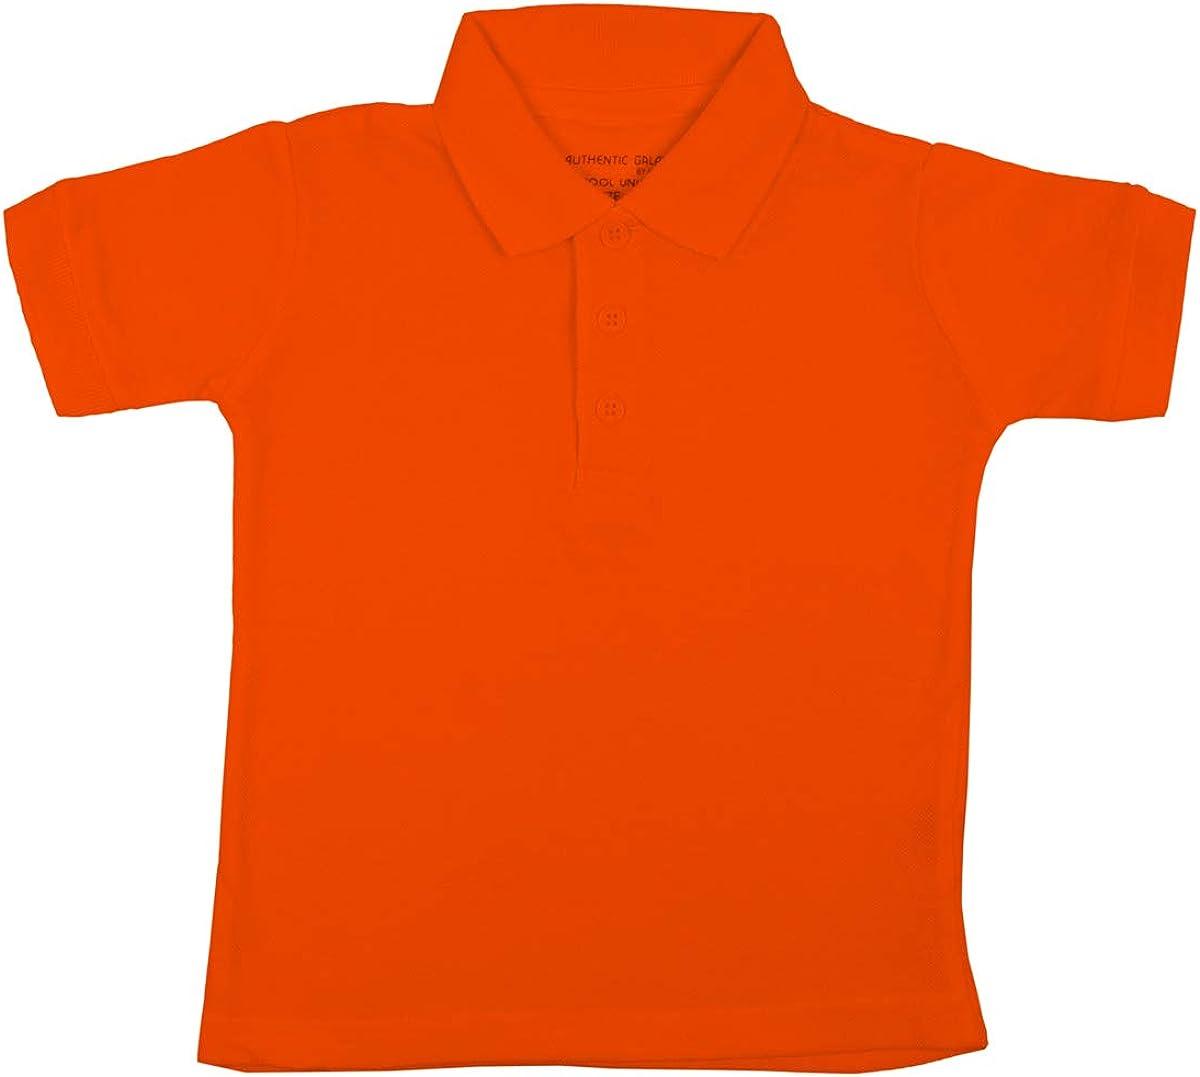 Authentic Galaxy Uniform Baby Boys Short Sleeve Pique Polo